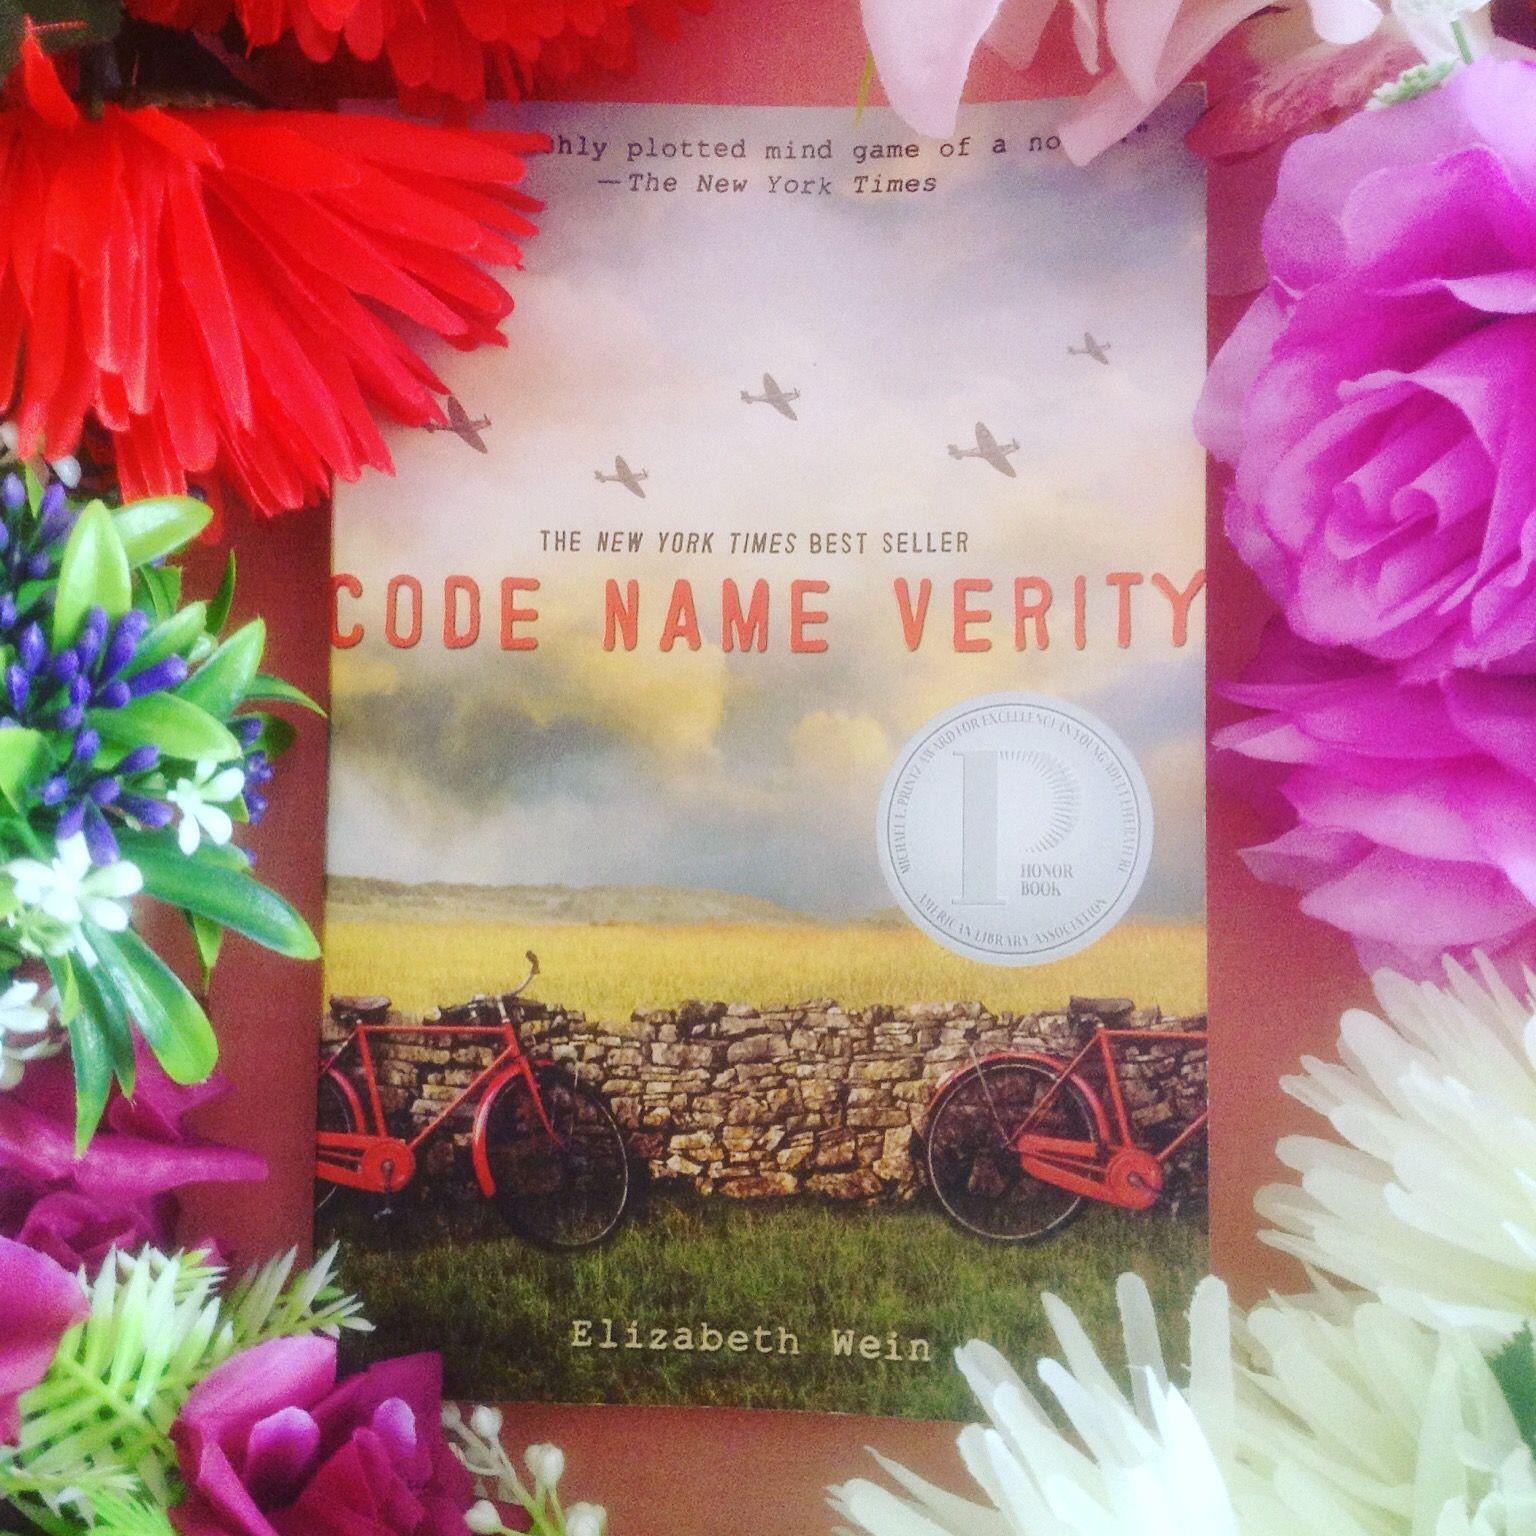 Cody Name Verity by Elizabeth Wein Code name verity